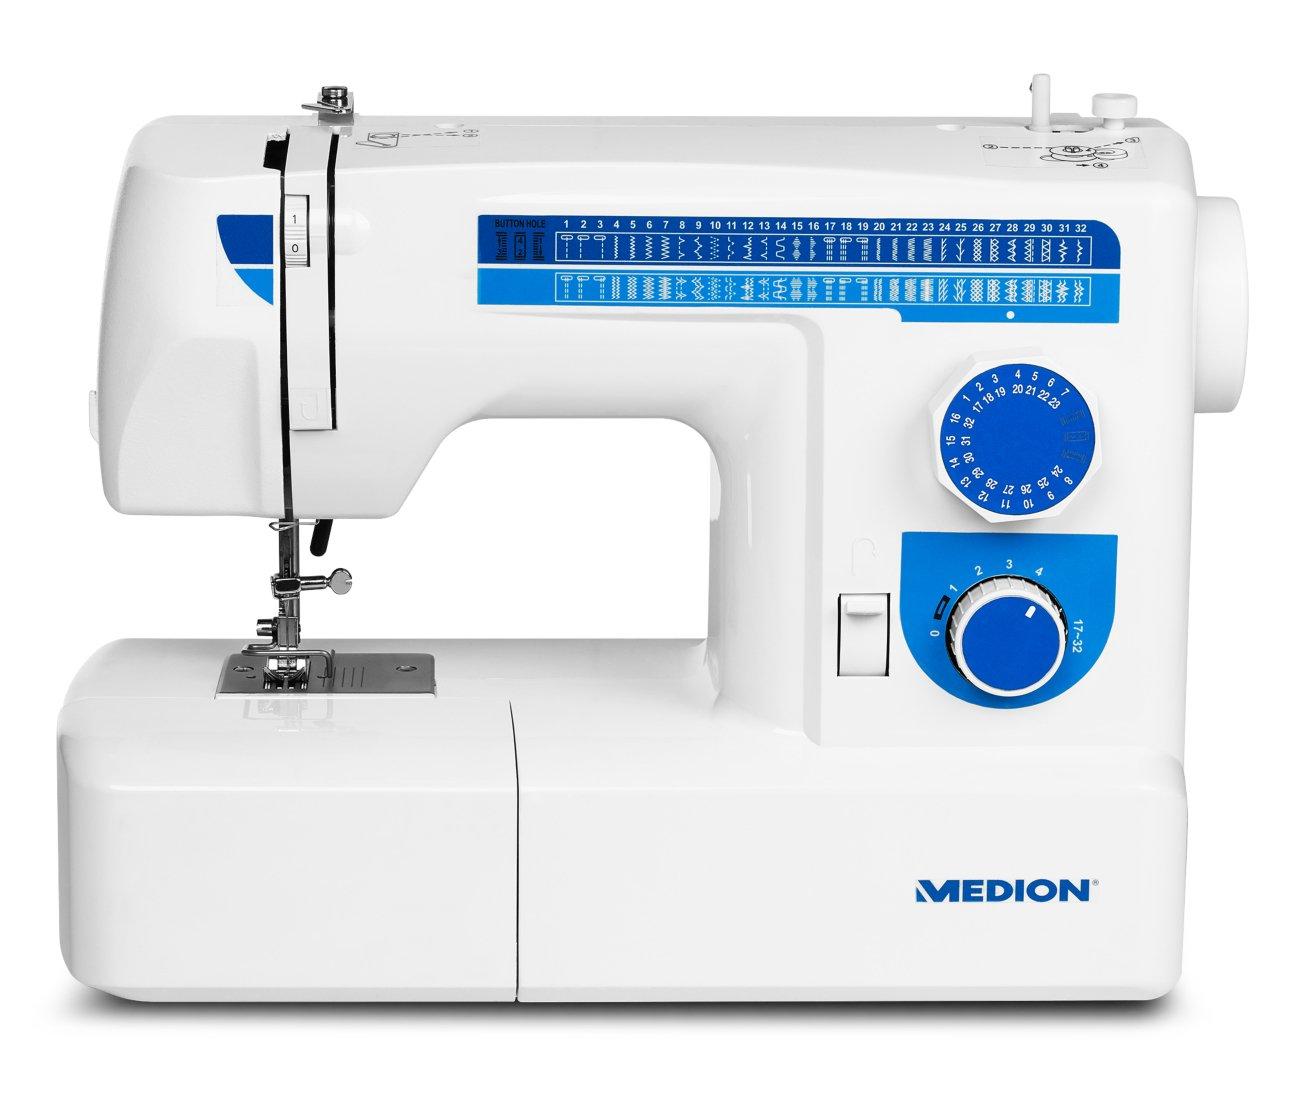 MEDION MD 17187 - Máquina de coser (Azul, Blanco, Máquina de coser semiautomática, Bordado, Overlock, Costura, Paso 4, Giratorio, 650 RPM): Amazon.es: Hogar